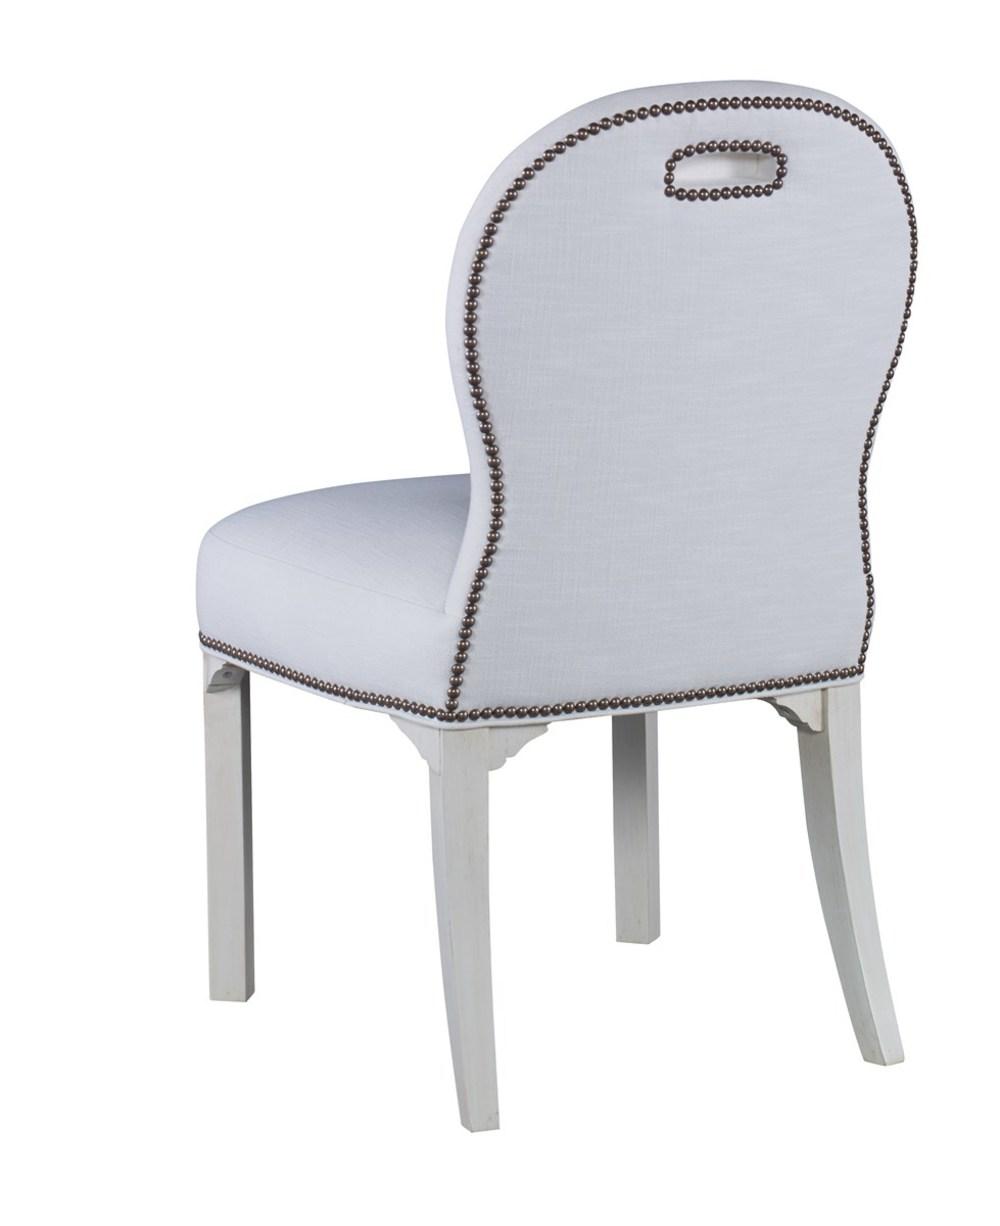 Chaddock - Dahlia Dining Side Chair